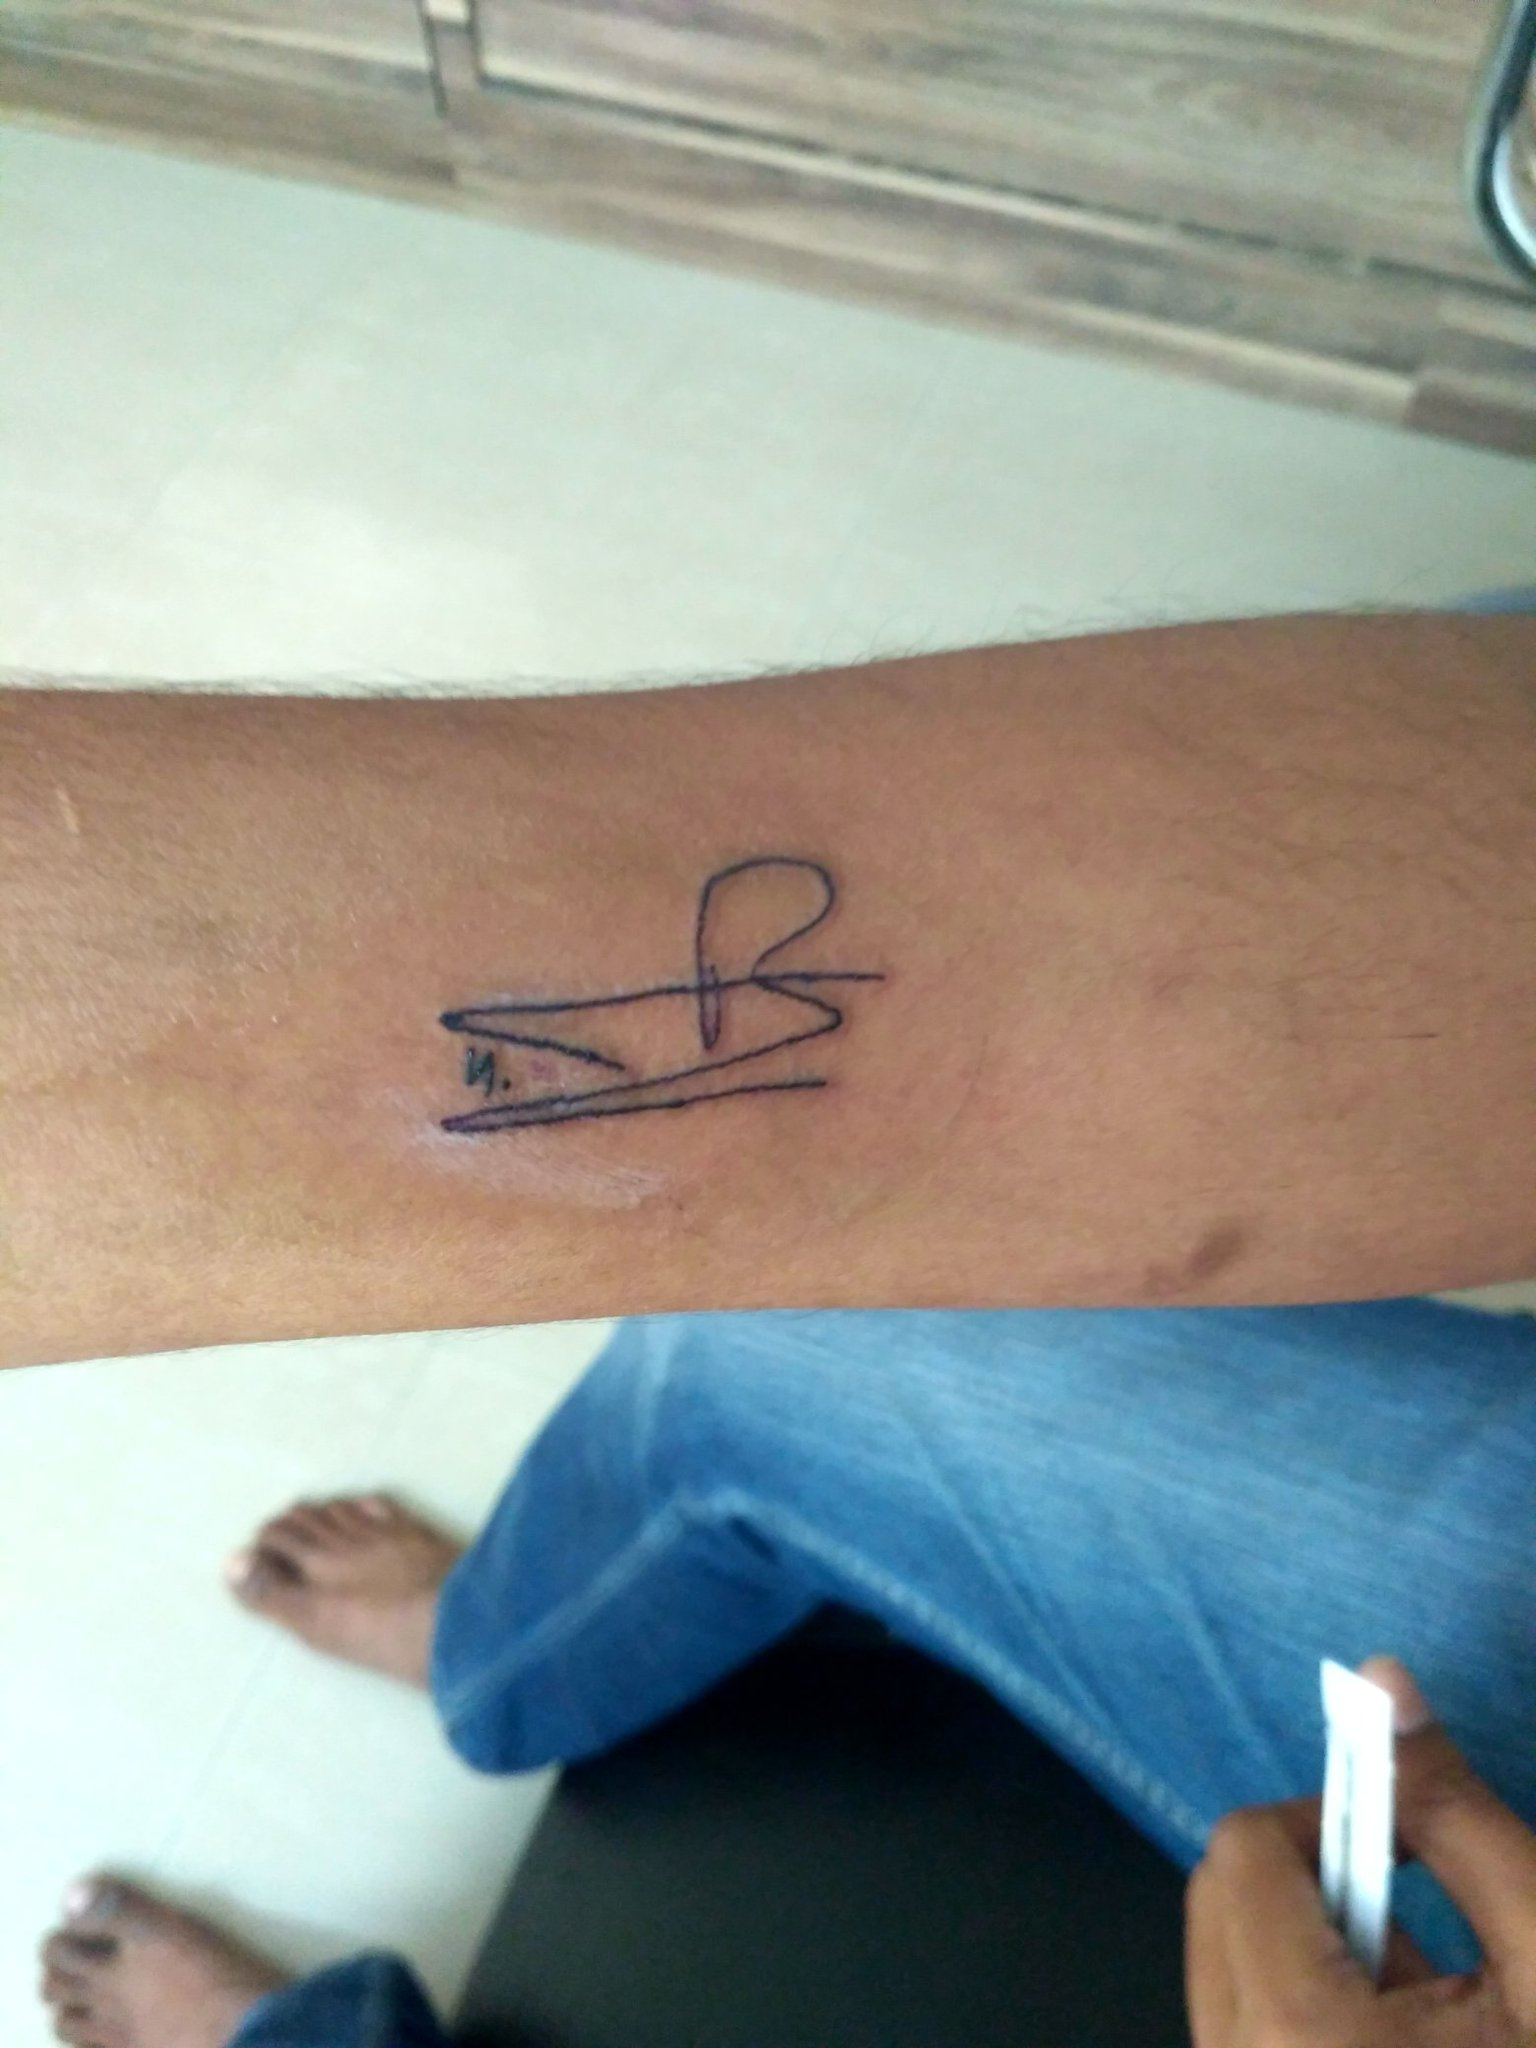 Tatooed @tarak9999 signature Permanent tatoo ✊✊ @ntrfanforever https://t.co/pxkvzvy6eb